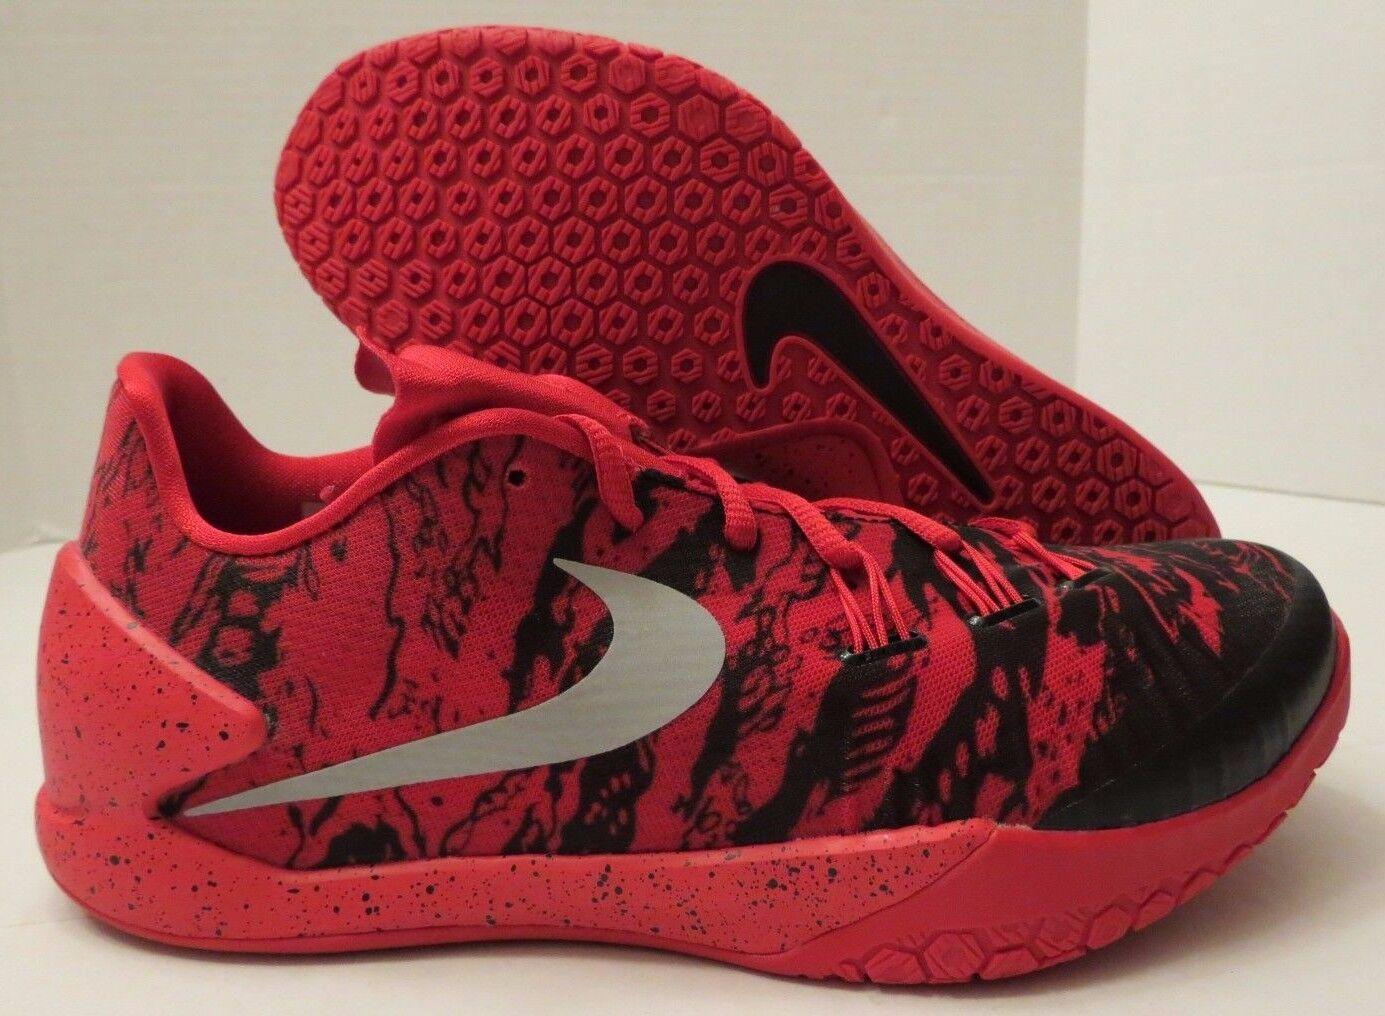 Nike hyperchase pe james harden 803215 verband 600 roter oktober selten verband 803215 (männer) 42c83a